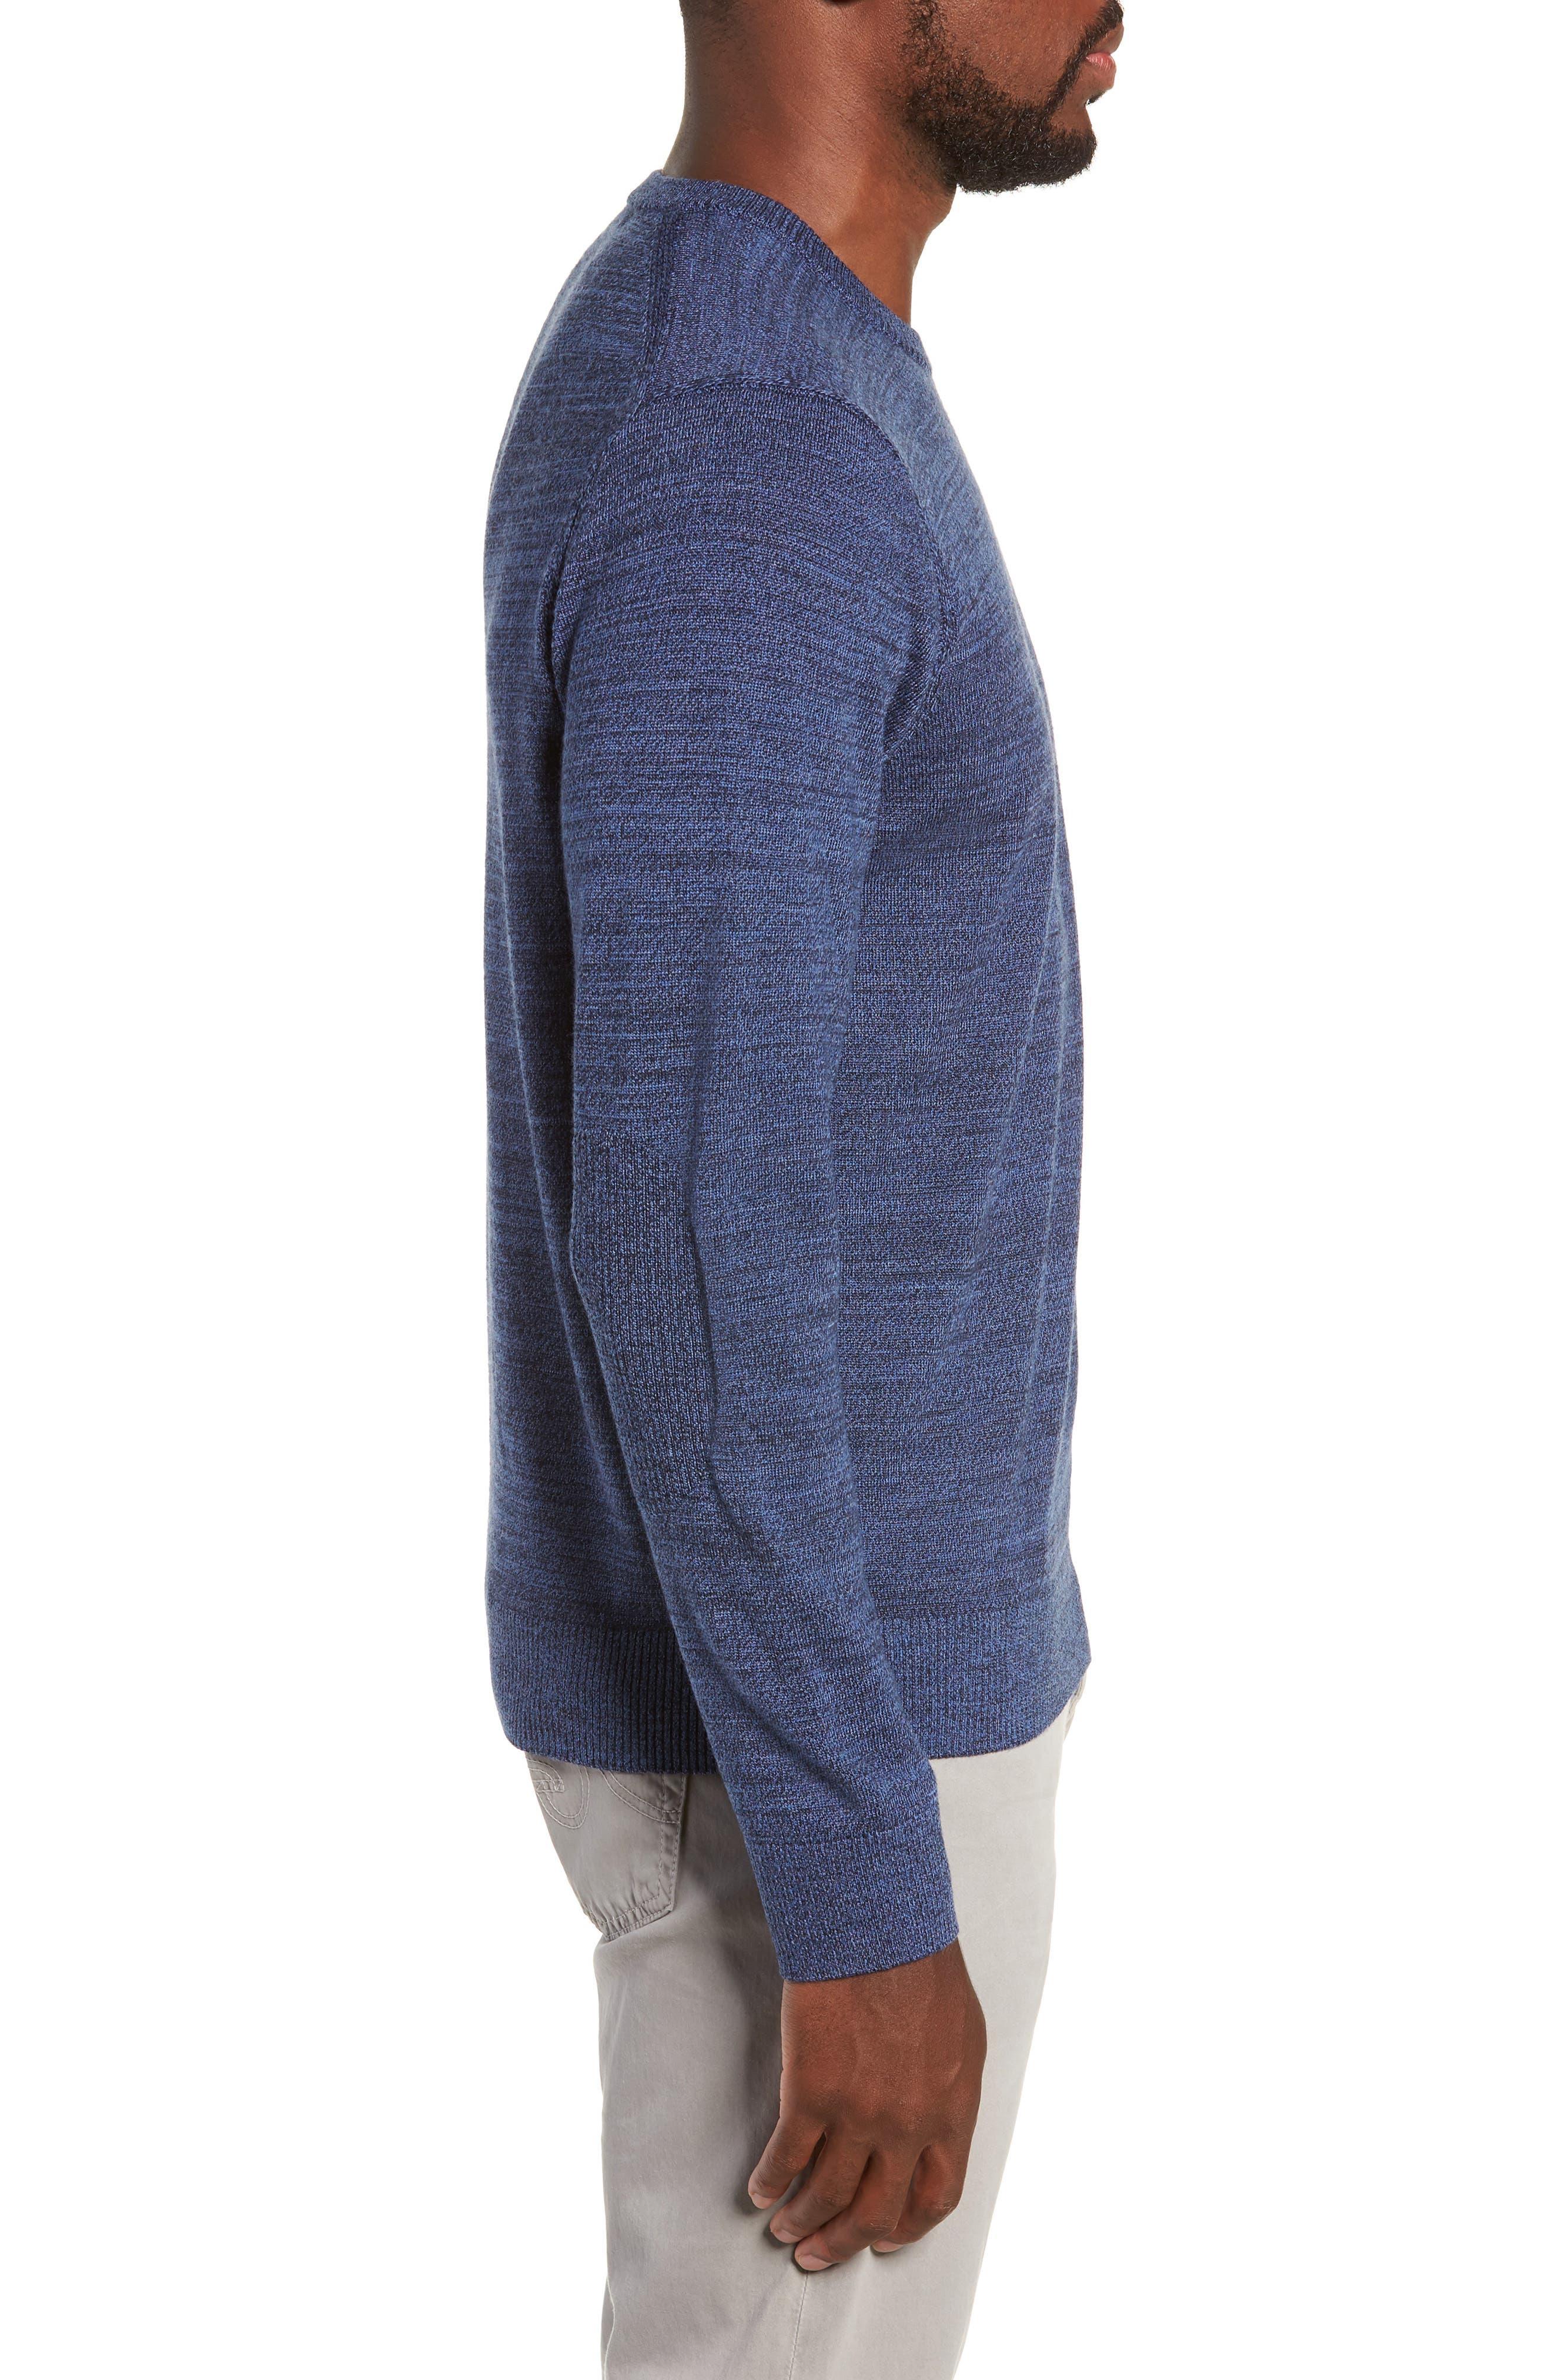 Intaria Star Merino Wool Sweater,                             Alternate thumbnail 3, color,                             BLUE